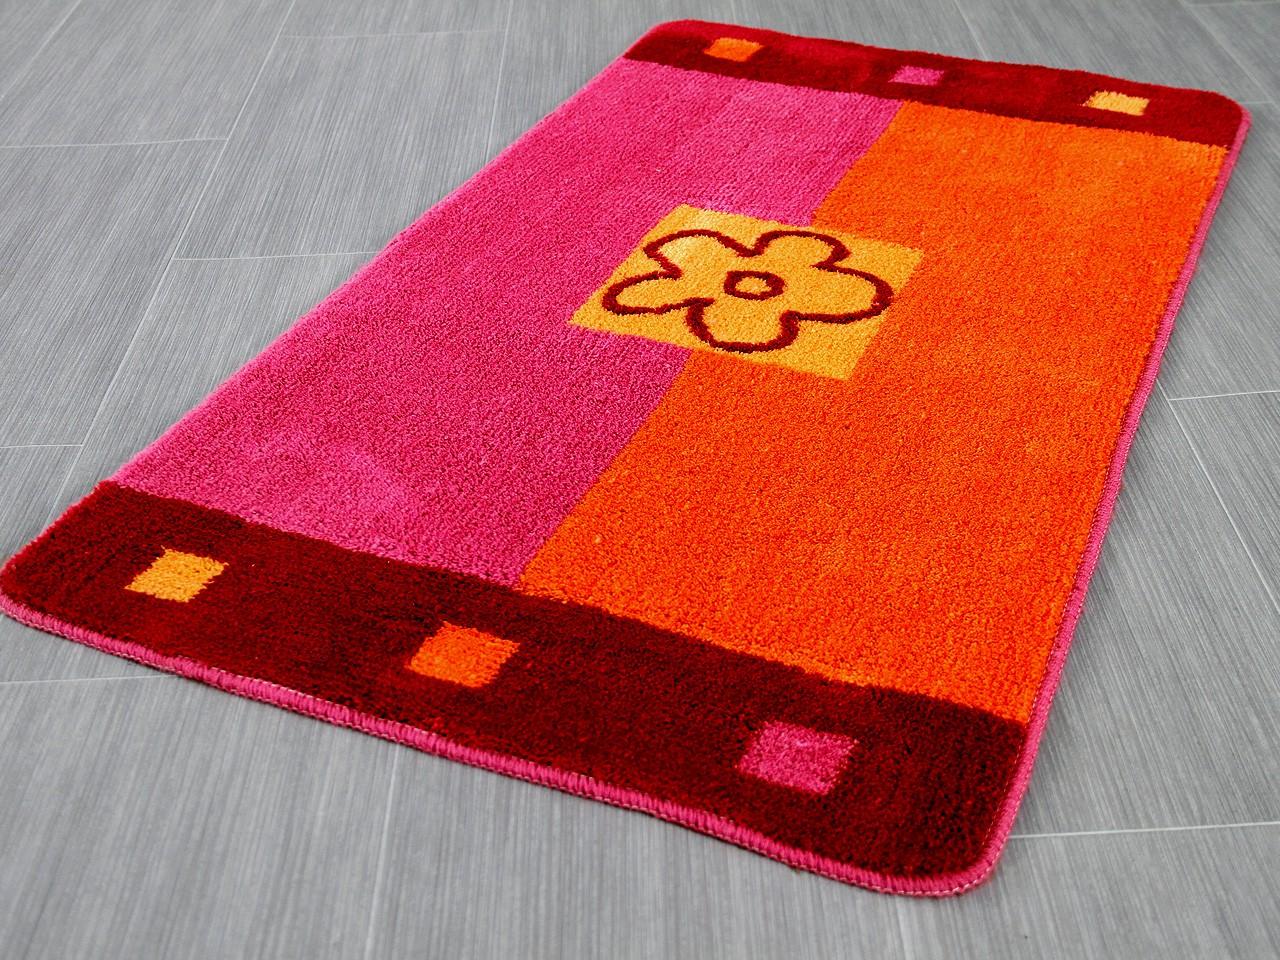 pacific badteppich maui orange pink blumen in 5 gr en badteppiche pacific badteppiche. Black Bedroom Furniture Sets. Home Design Ideas